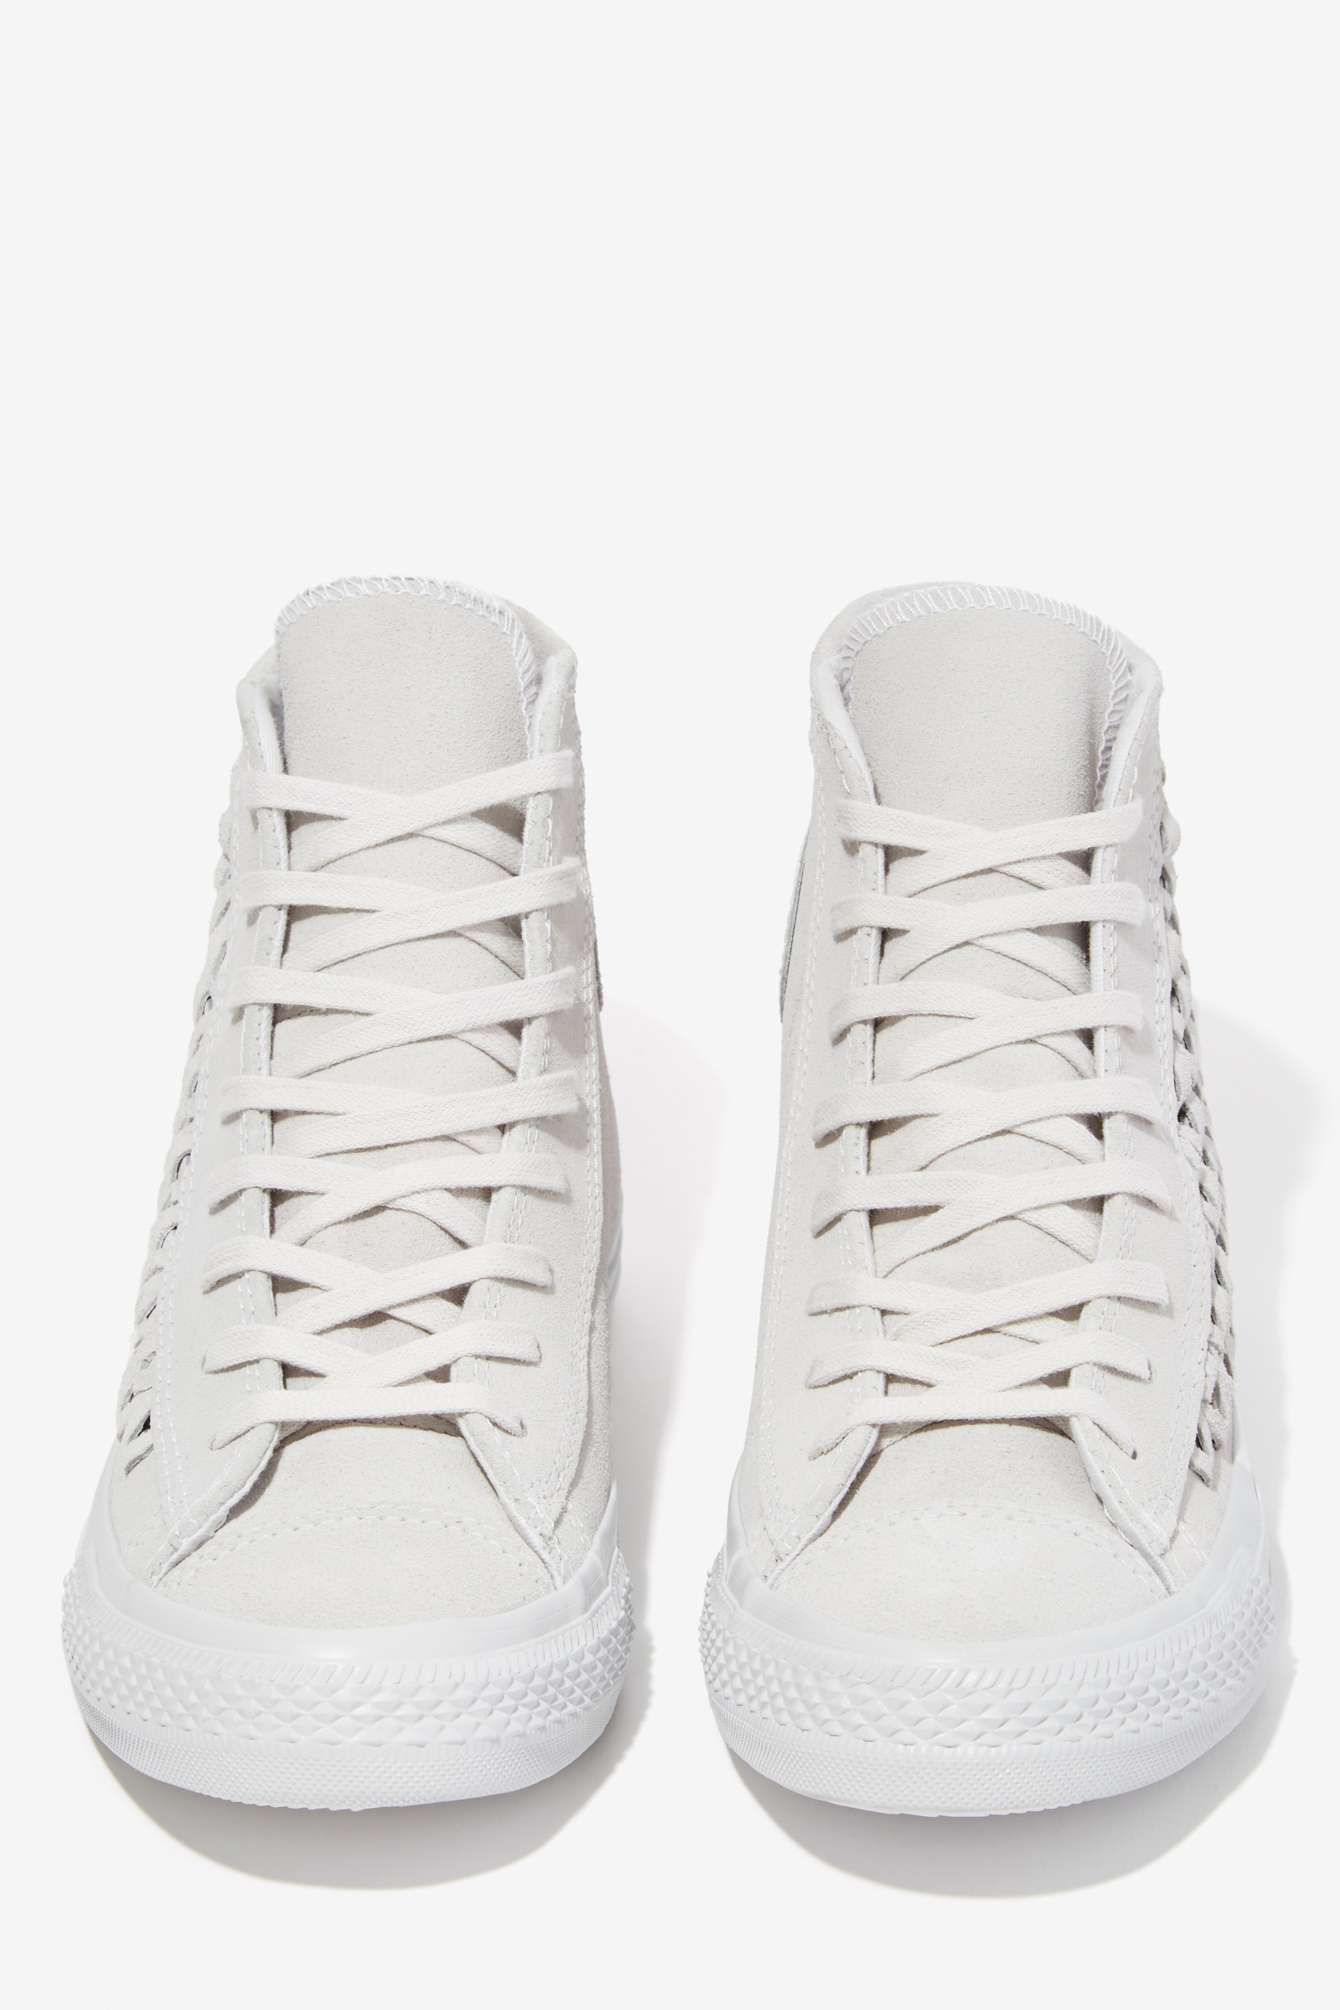 aa3e9b15c51 Converse All Star High-Top Suede Sneaker - Woven Gray